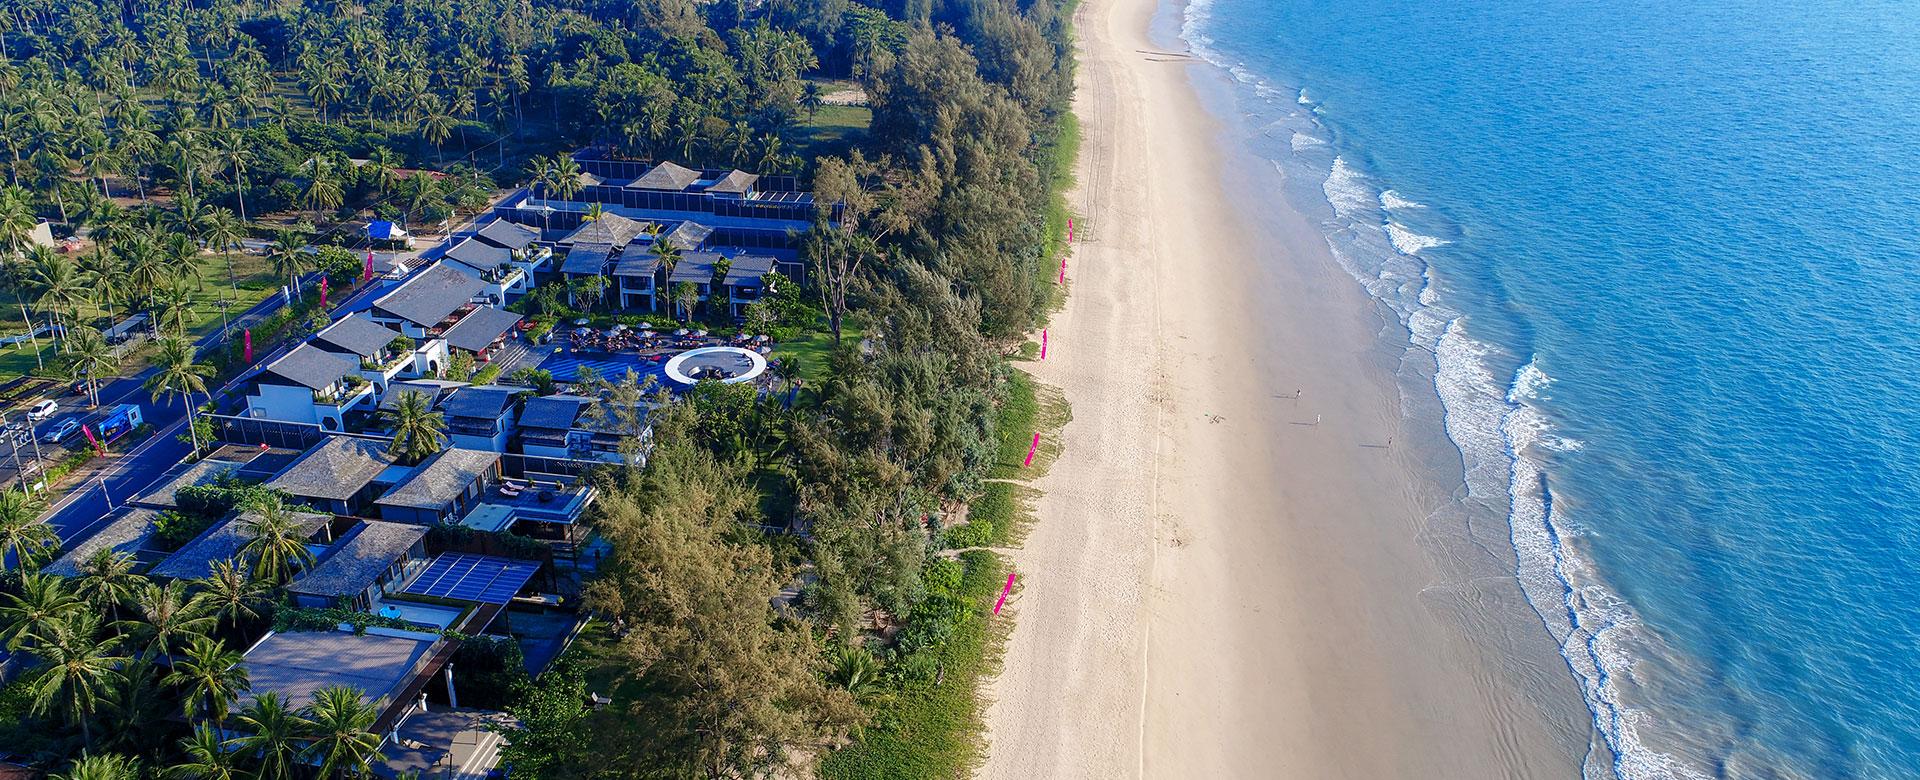 1-Facilities-Baba-Beach-Club-Luxury-Hotel-Phuket-by-Sri-Panwa